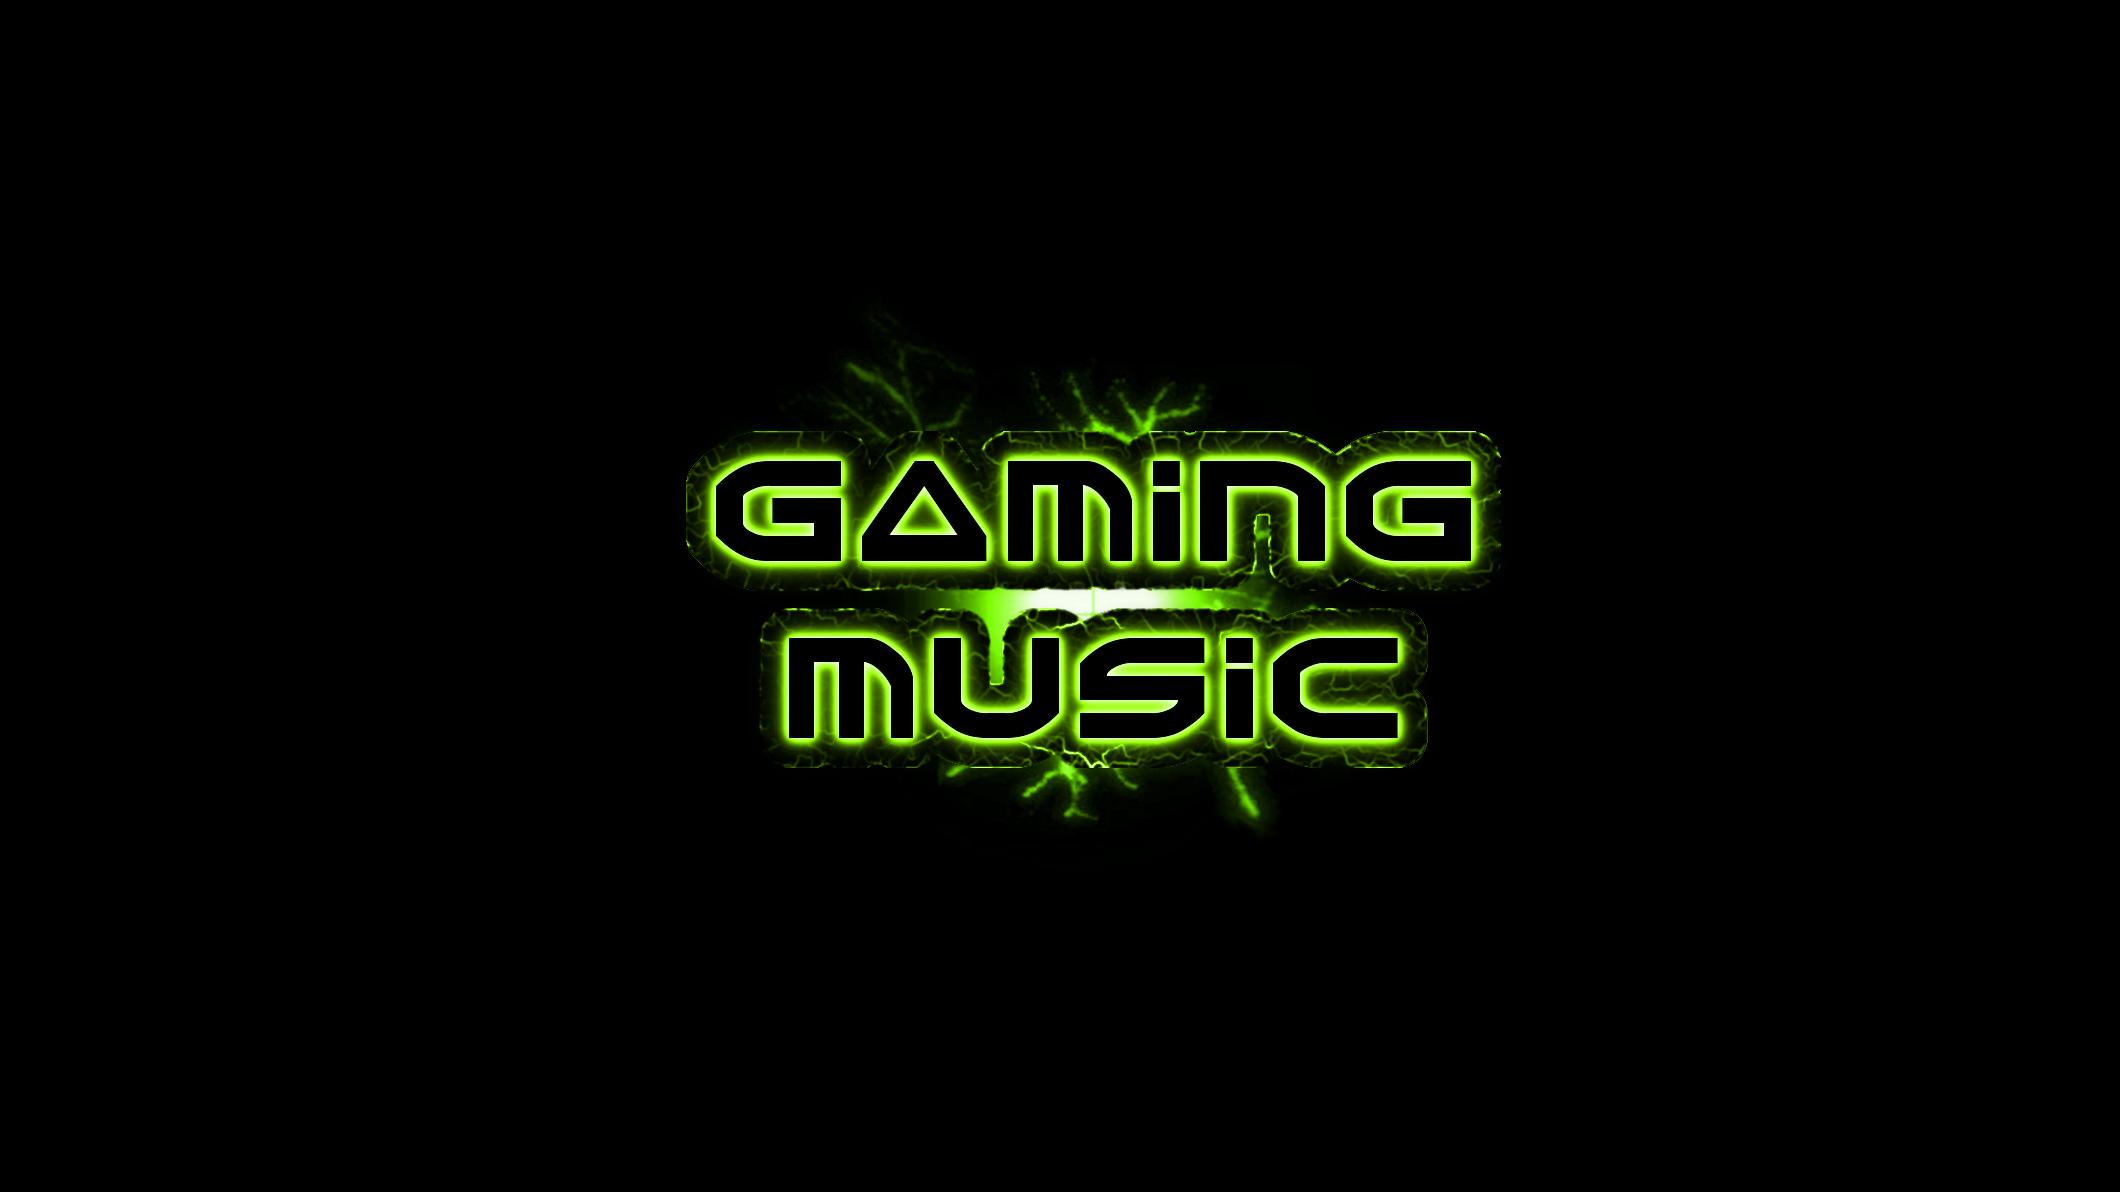 Gaming/ Music - Custom Channel Art by EverBadDesigns on DeviantArt